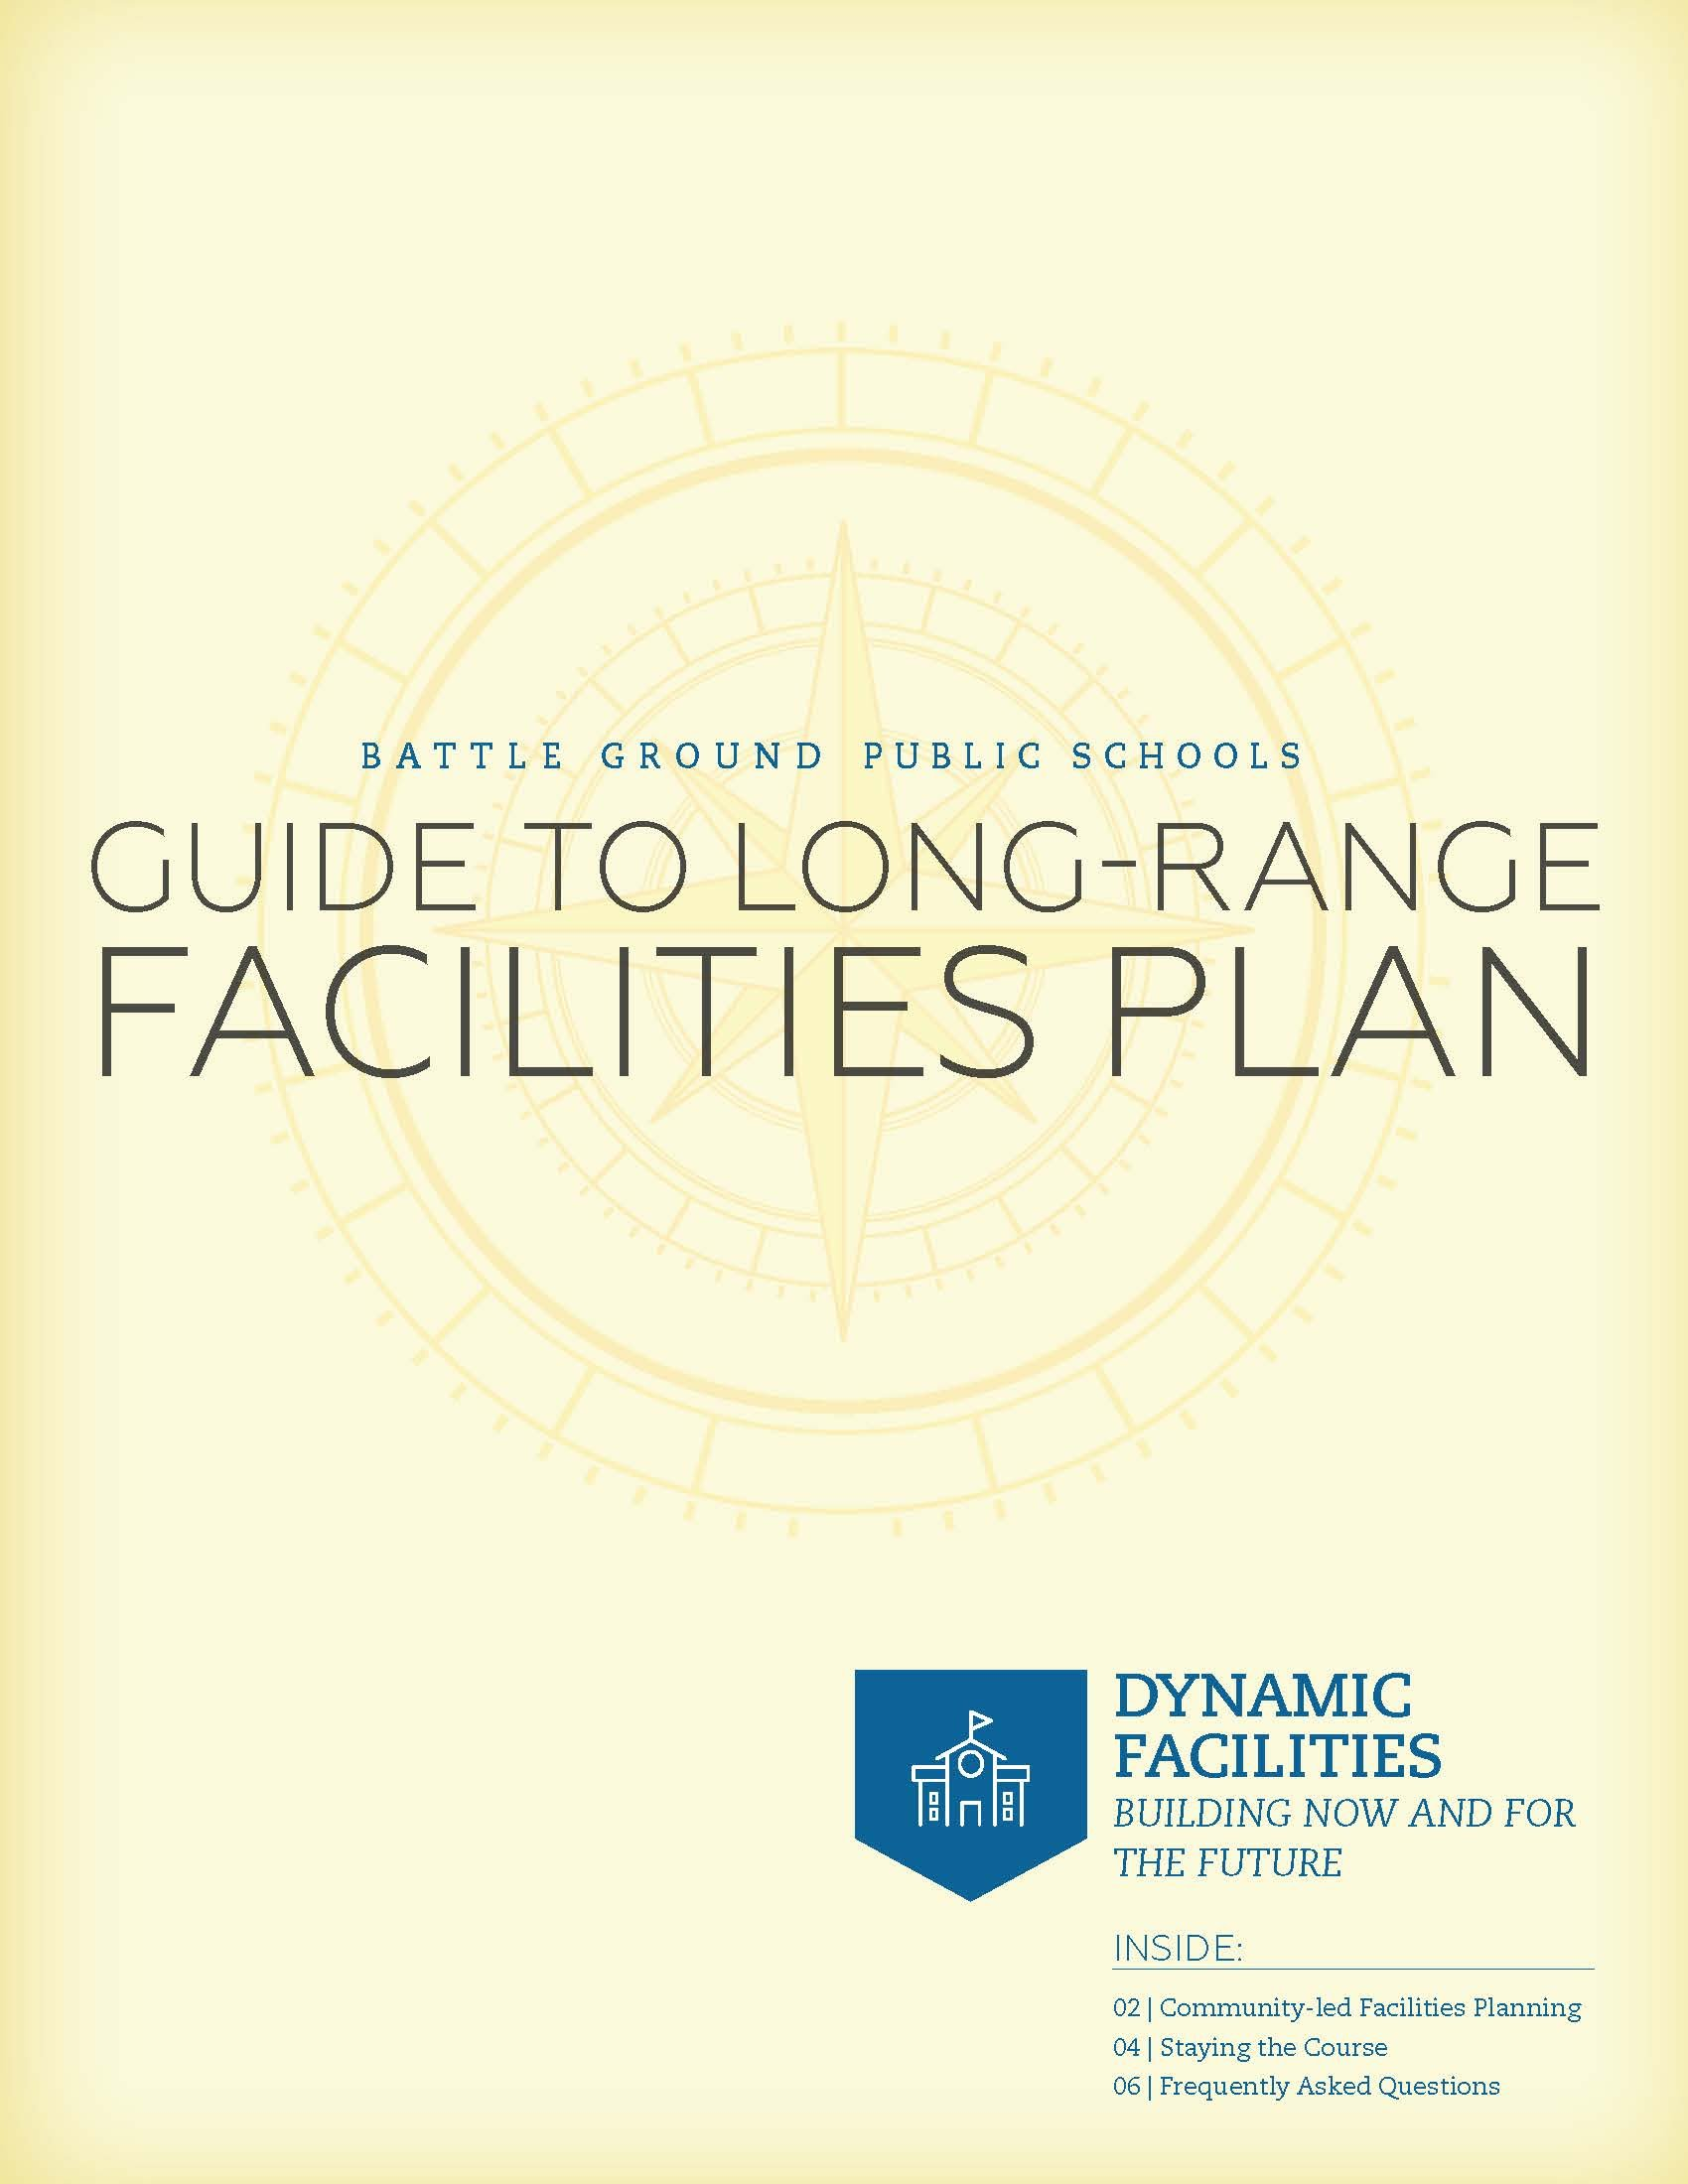 https://battlegroundps.uberflip.com/i/705564-2016-guide-to-long-range-facilities-plan